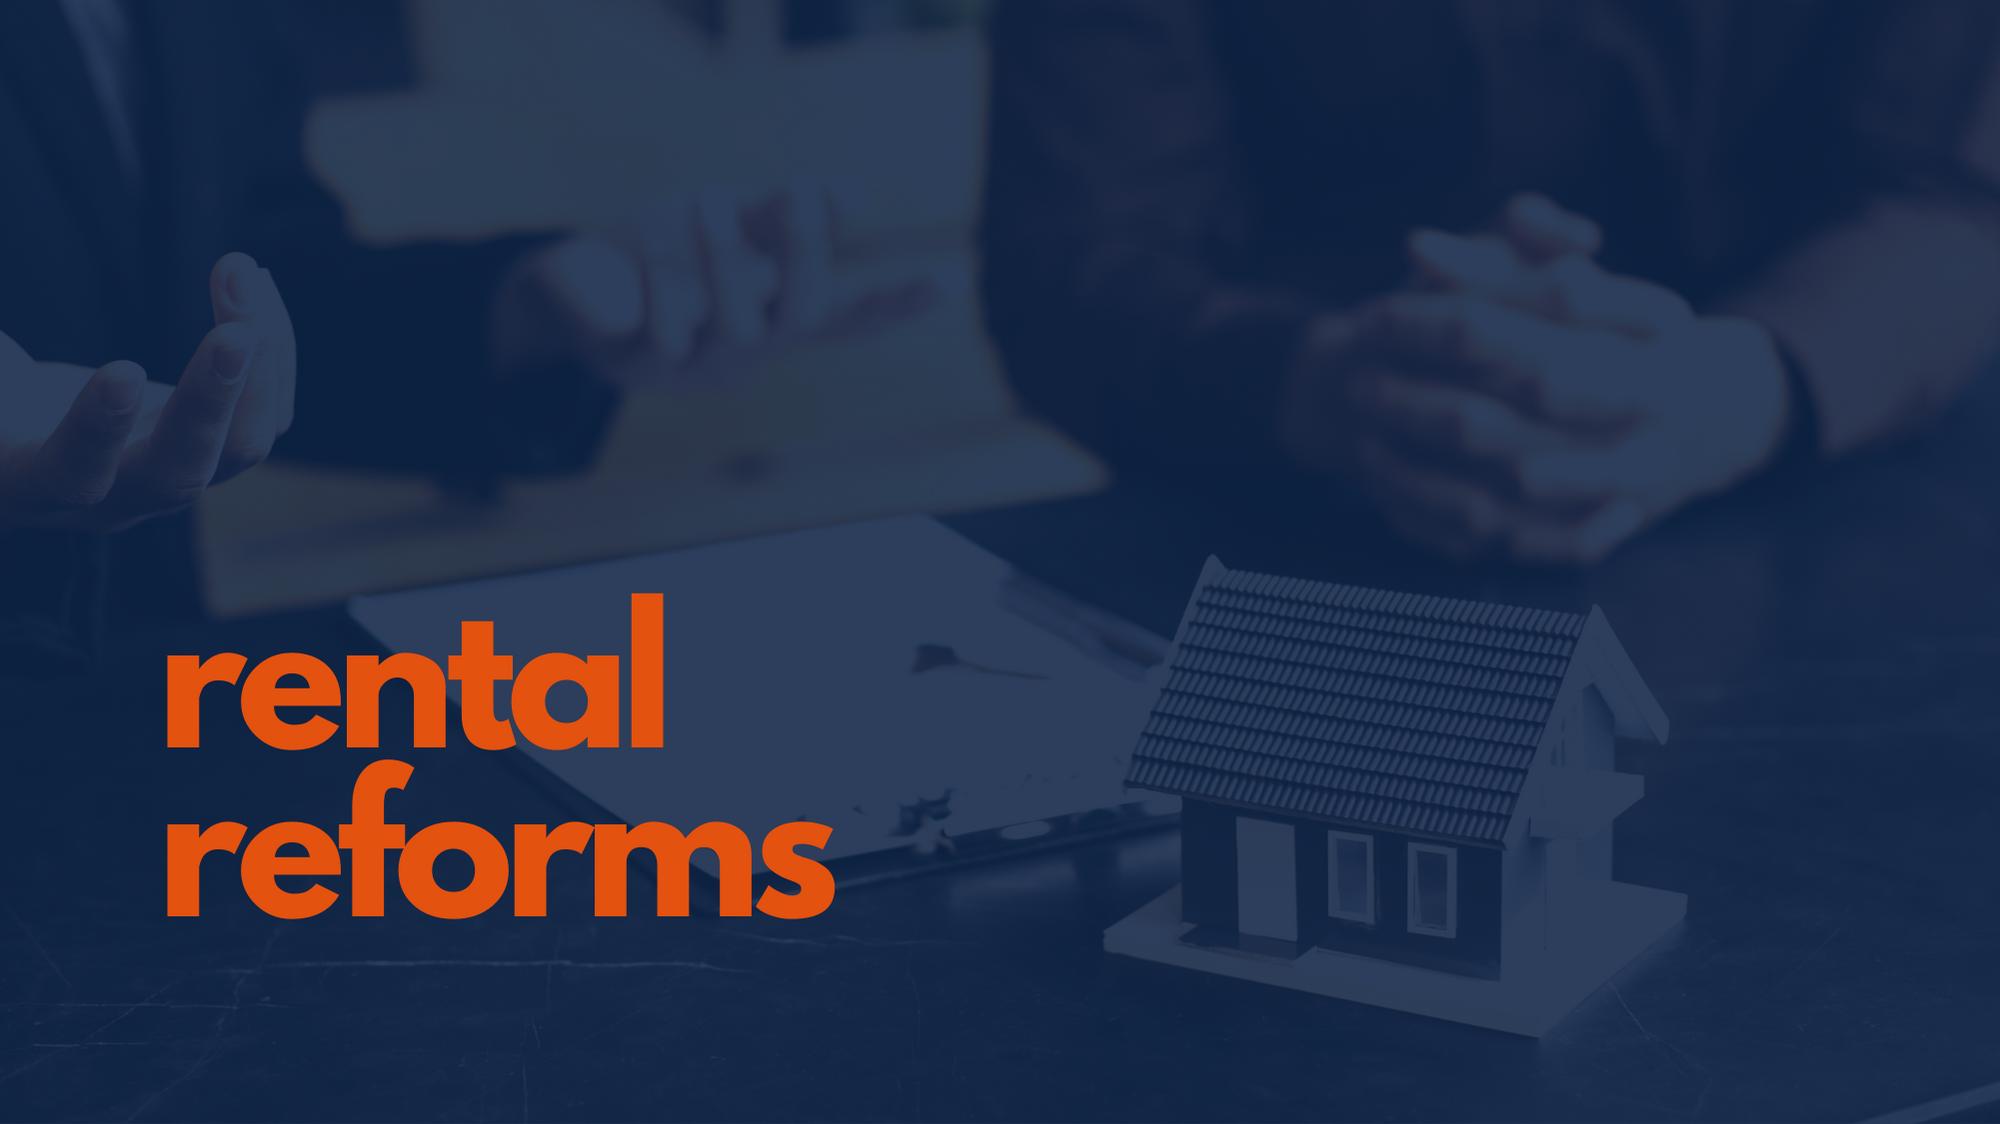 rental reforms